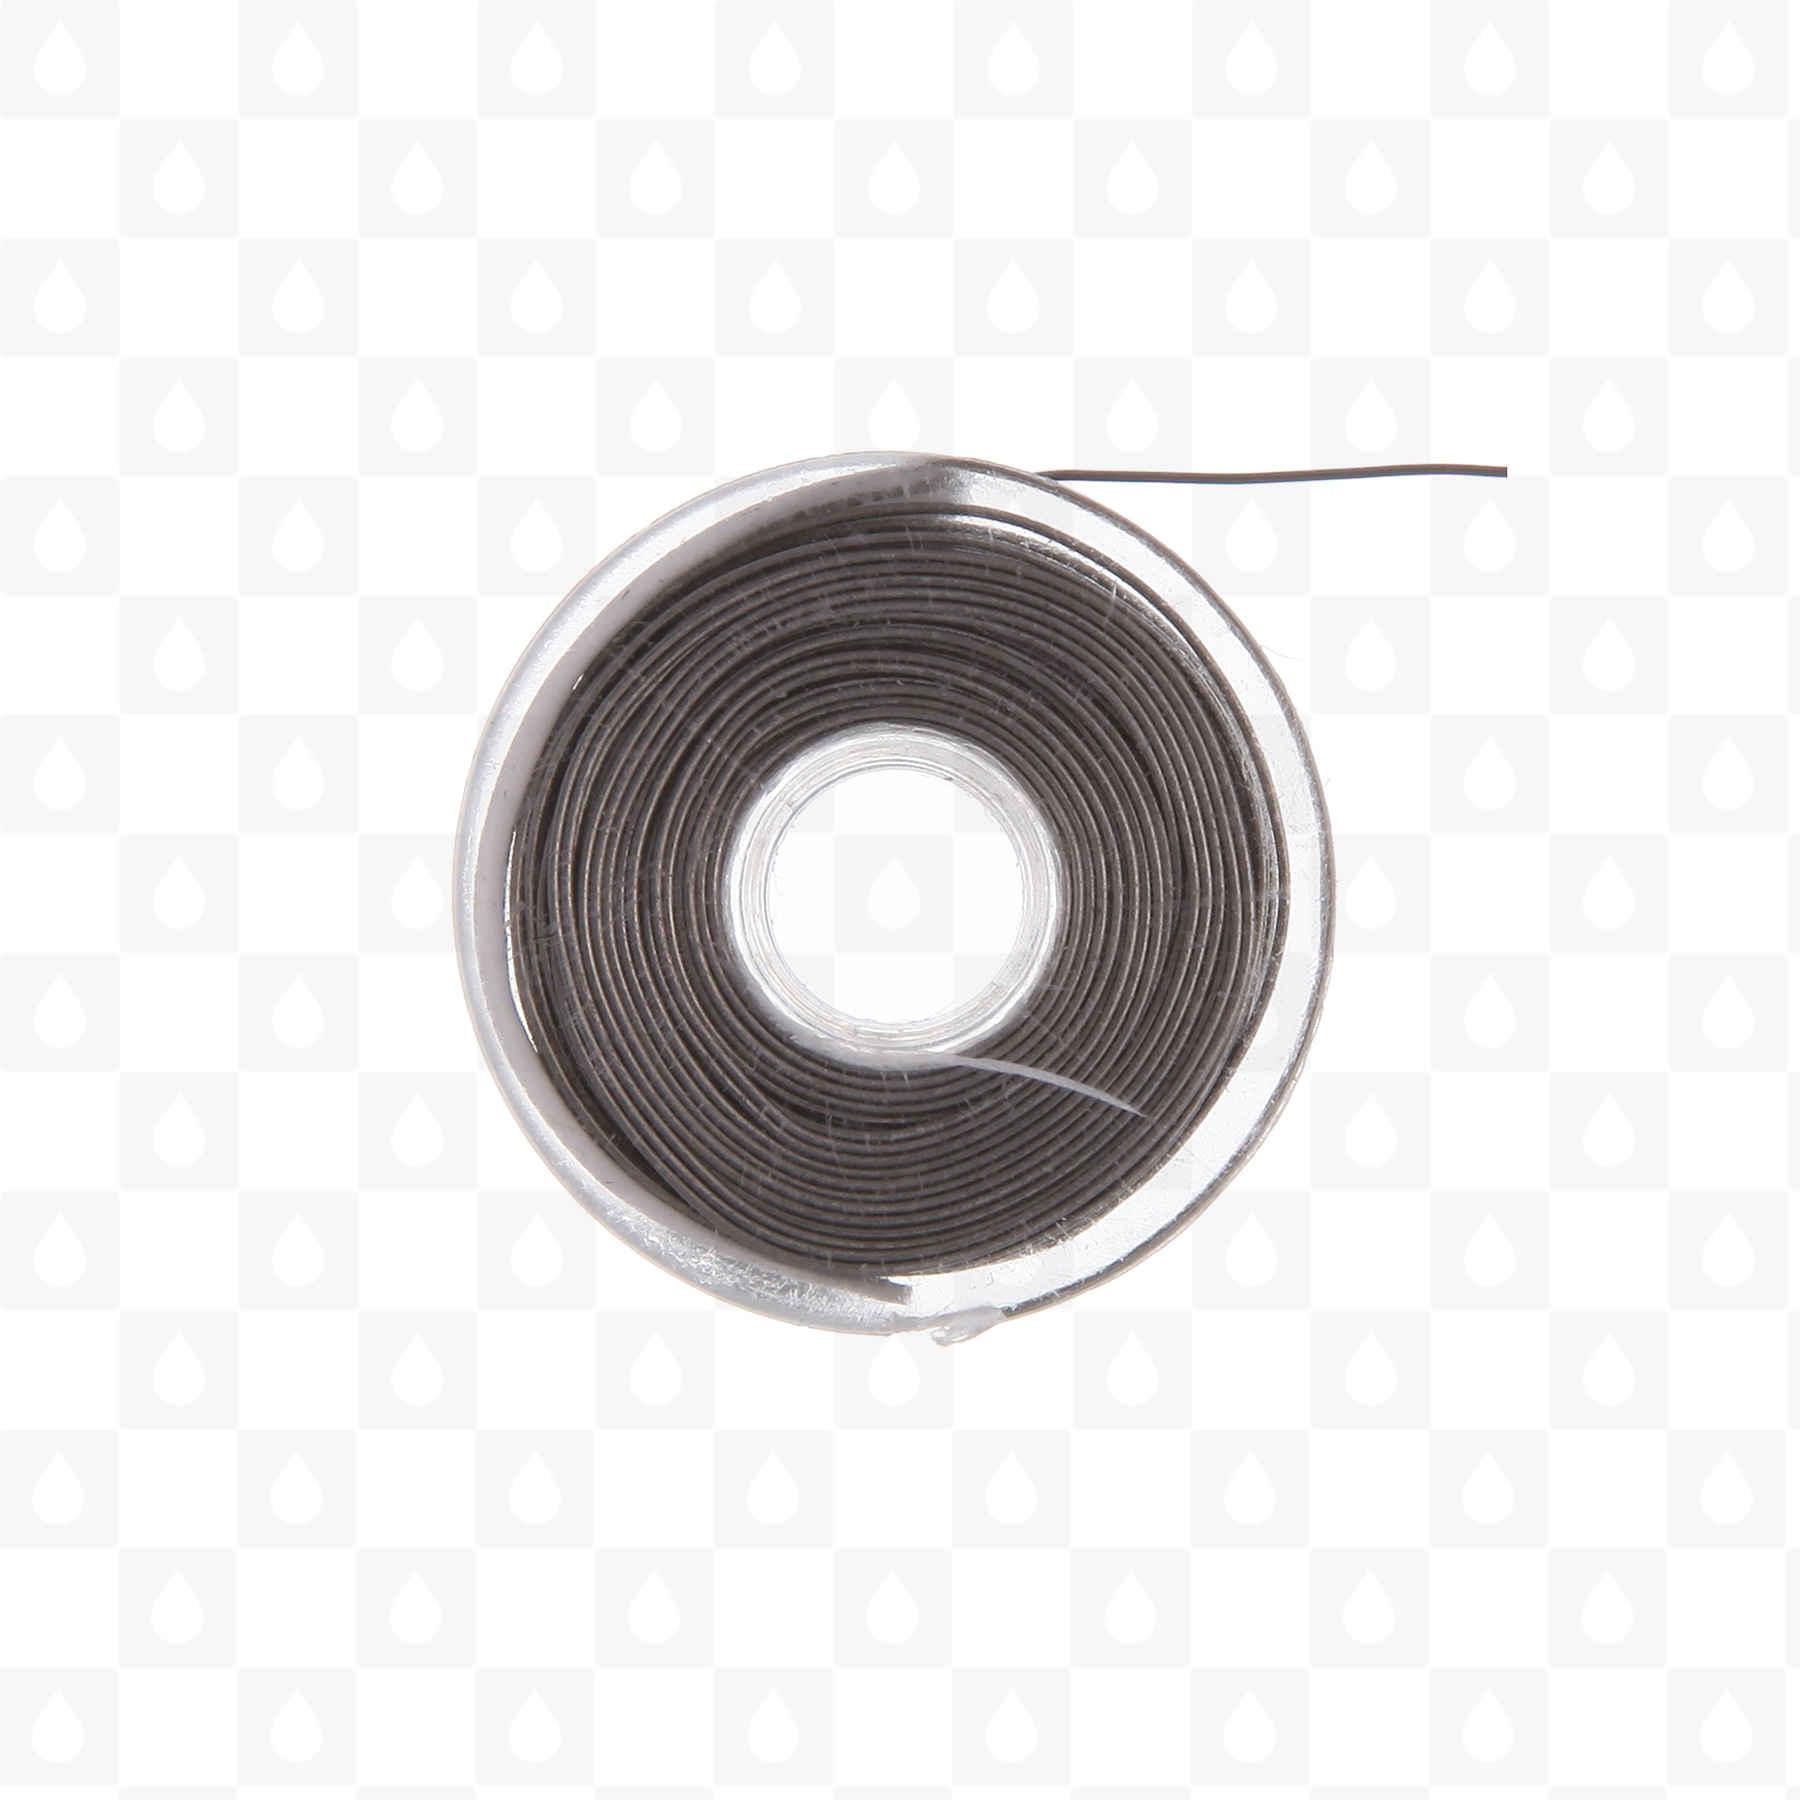 Nickel Chrome 80/20 Soft Heat Resistance Wire - 10 Meter Spools ...